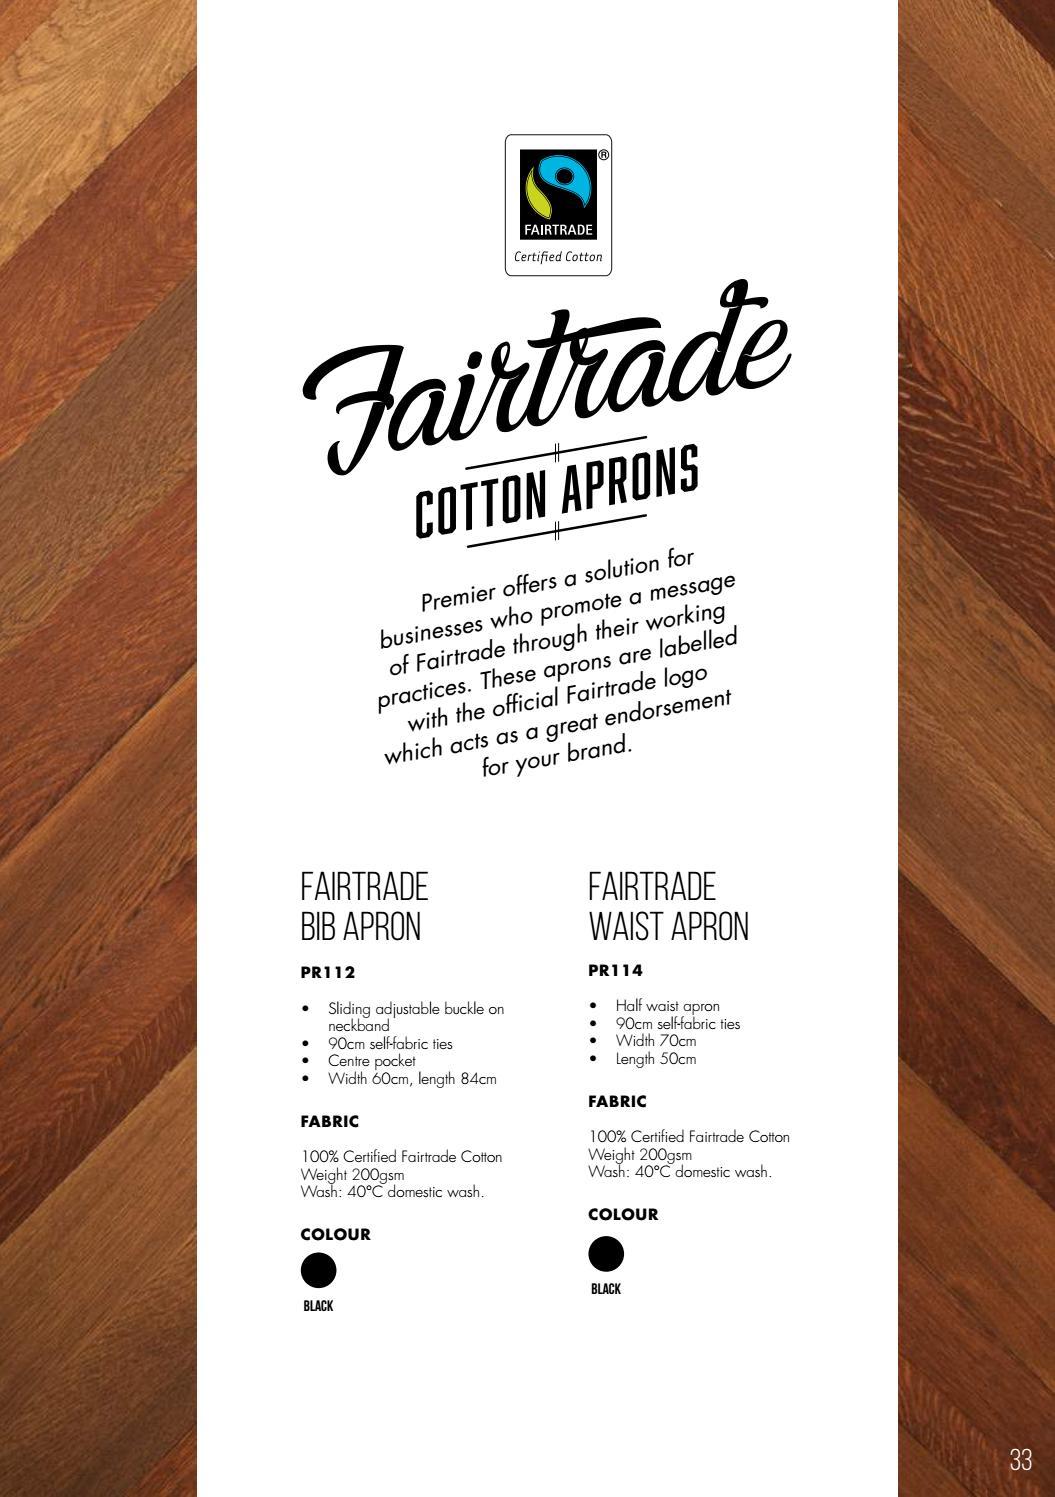 Premier 100/% Cotton Fairtrade Apron